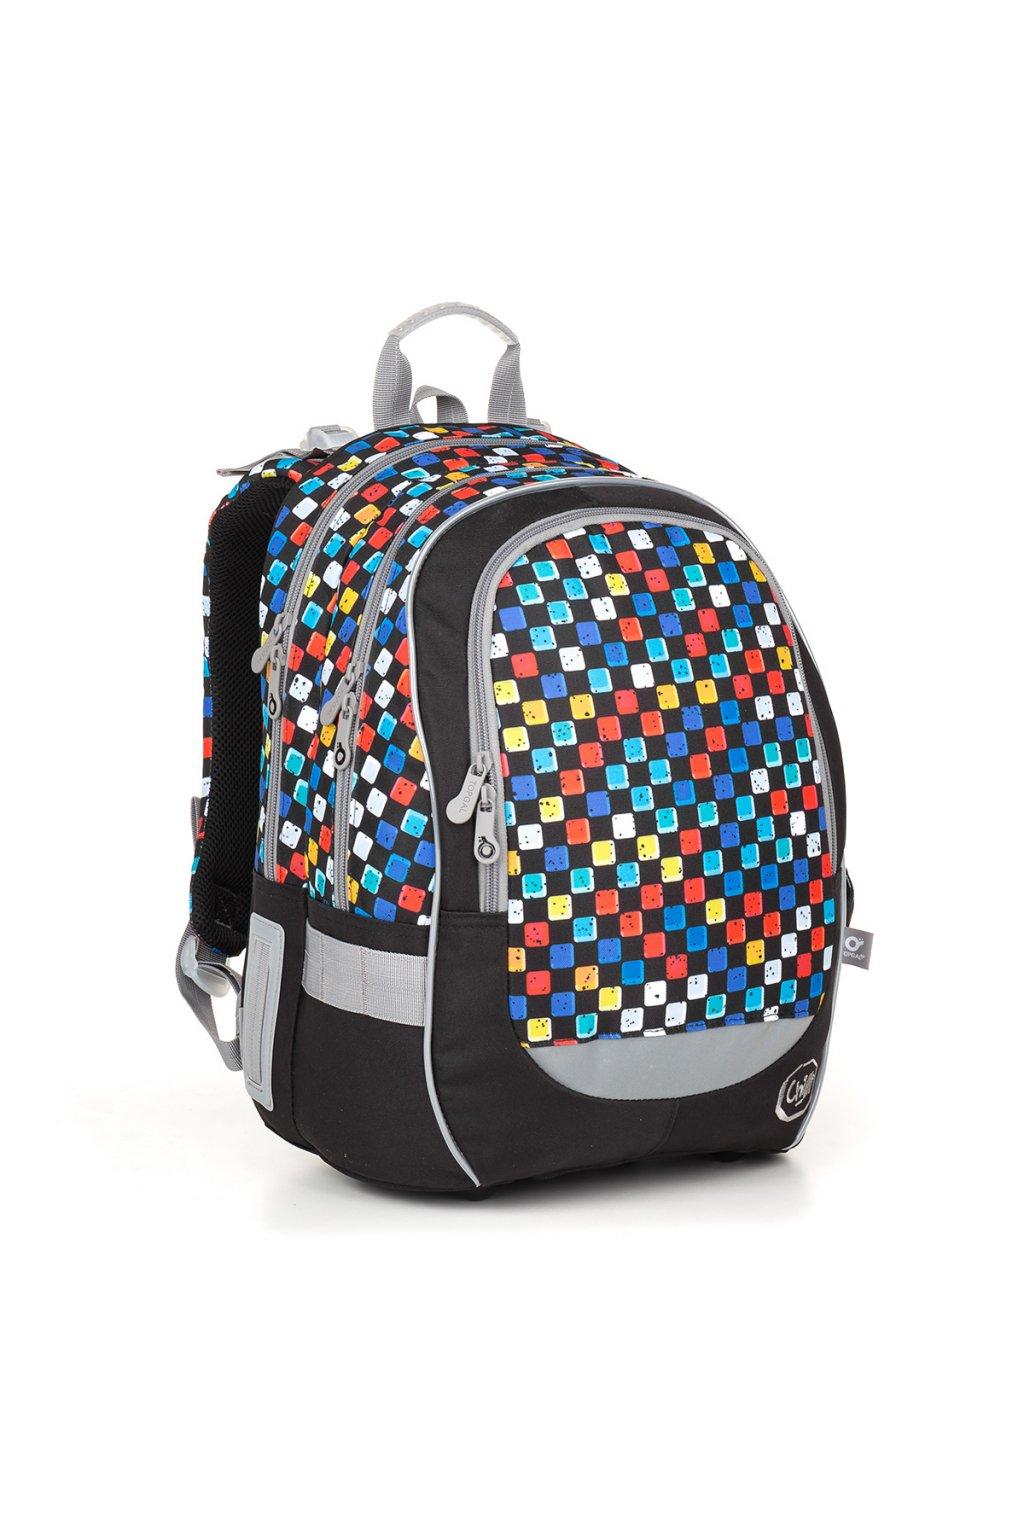 chlapecký školní batoh topgal coda 18020 b